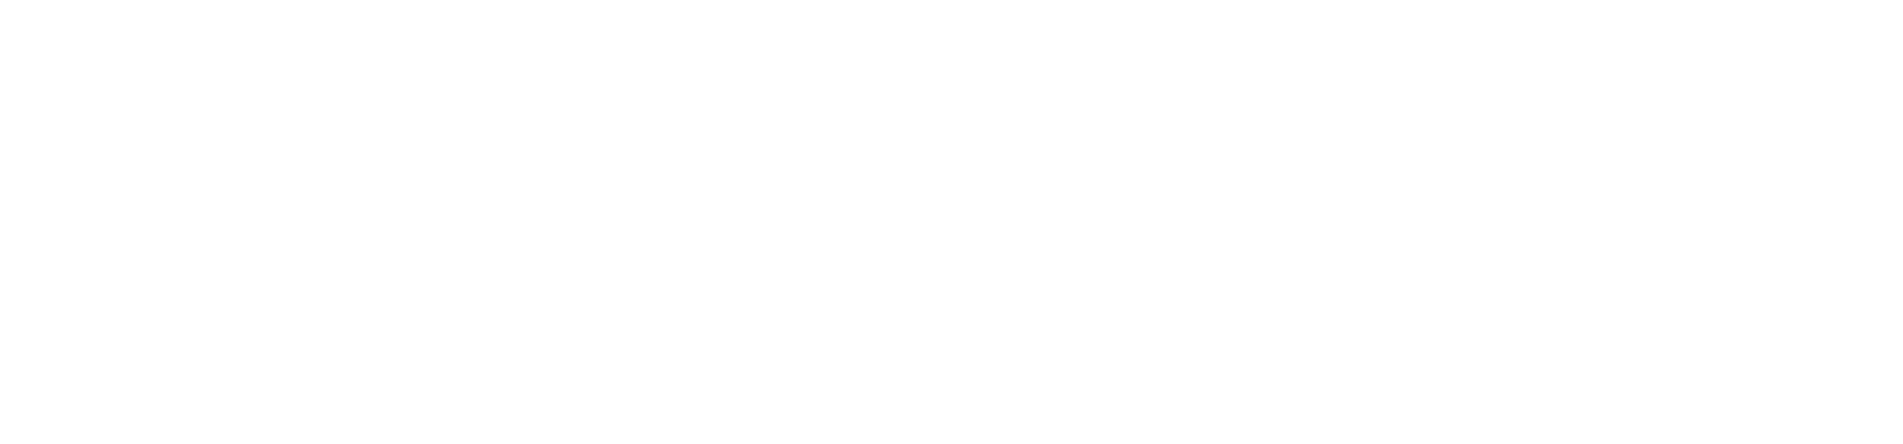 bruthen-blues-festival-2018